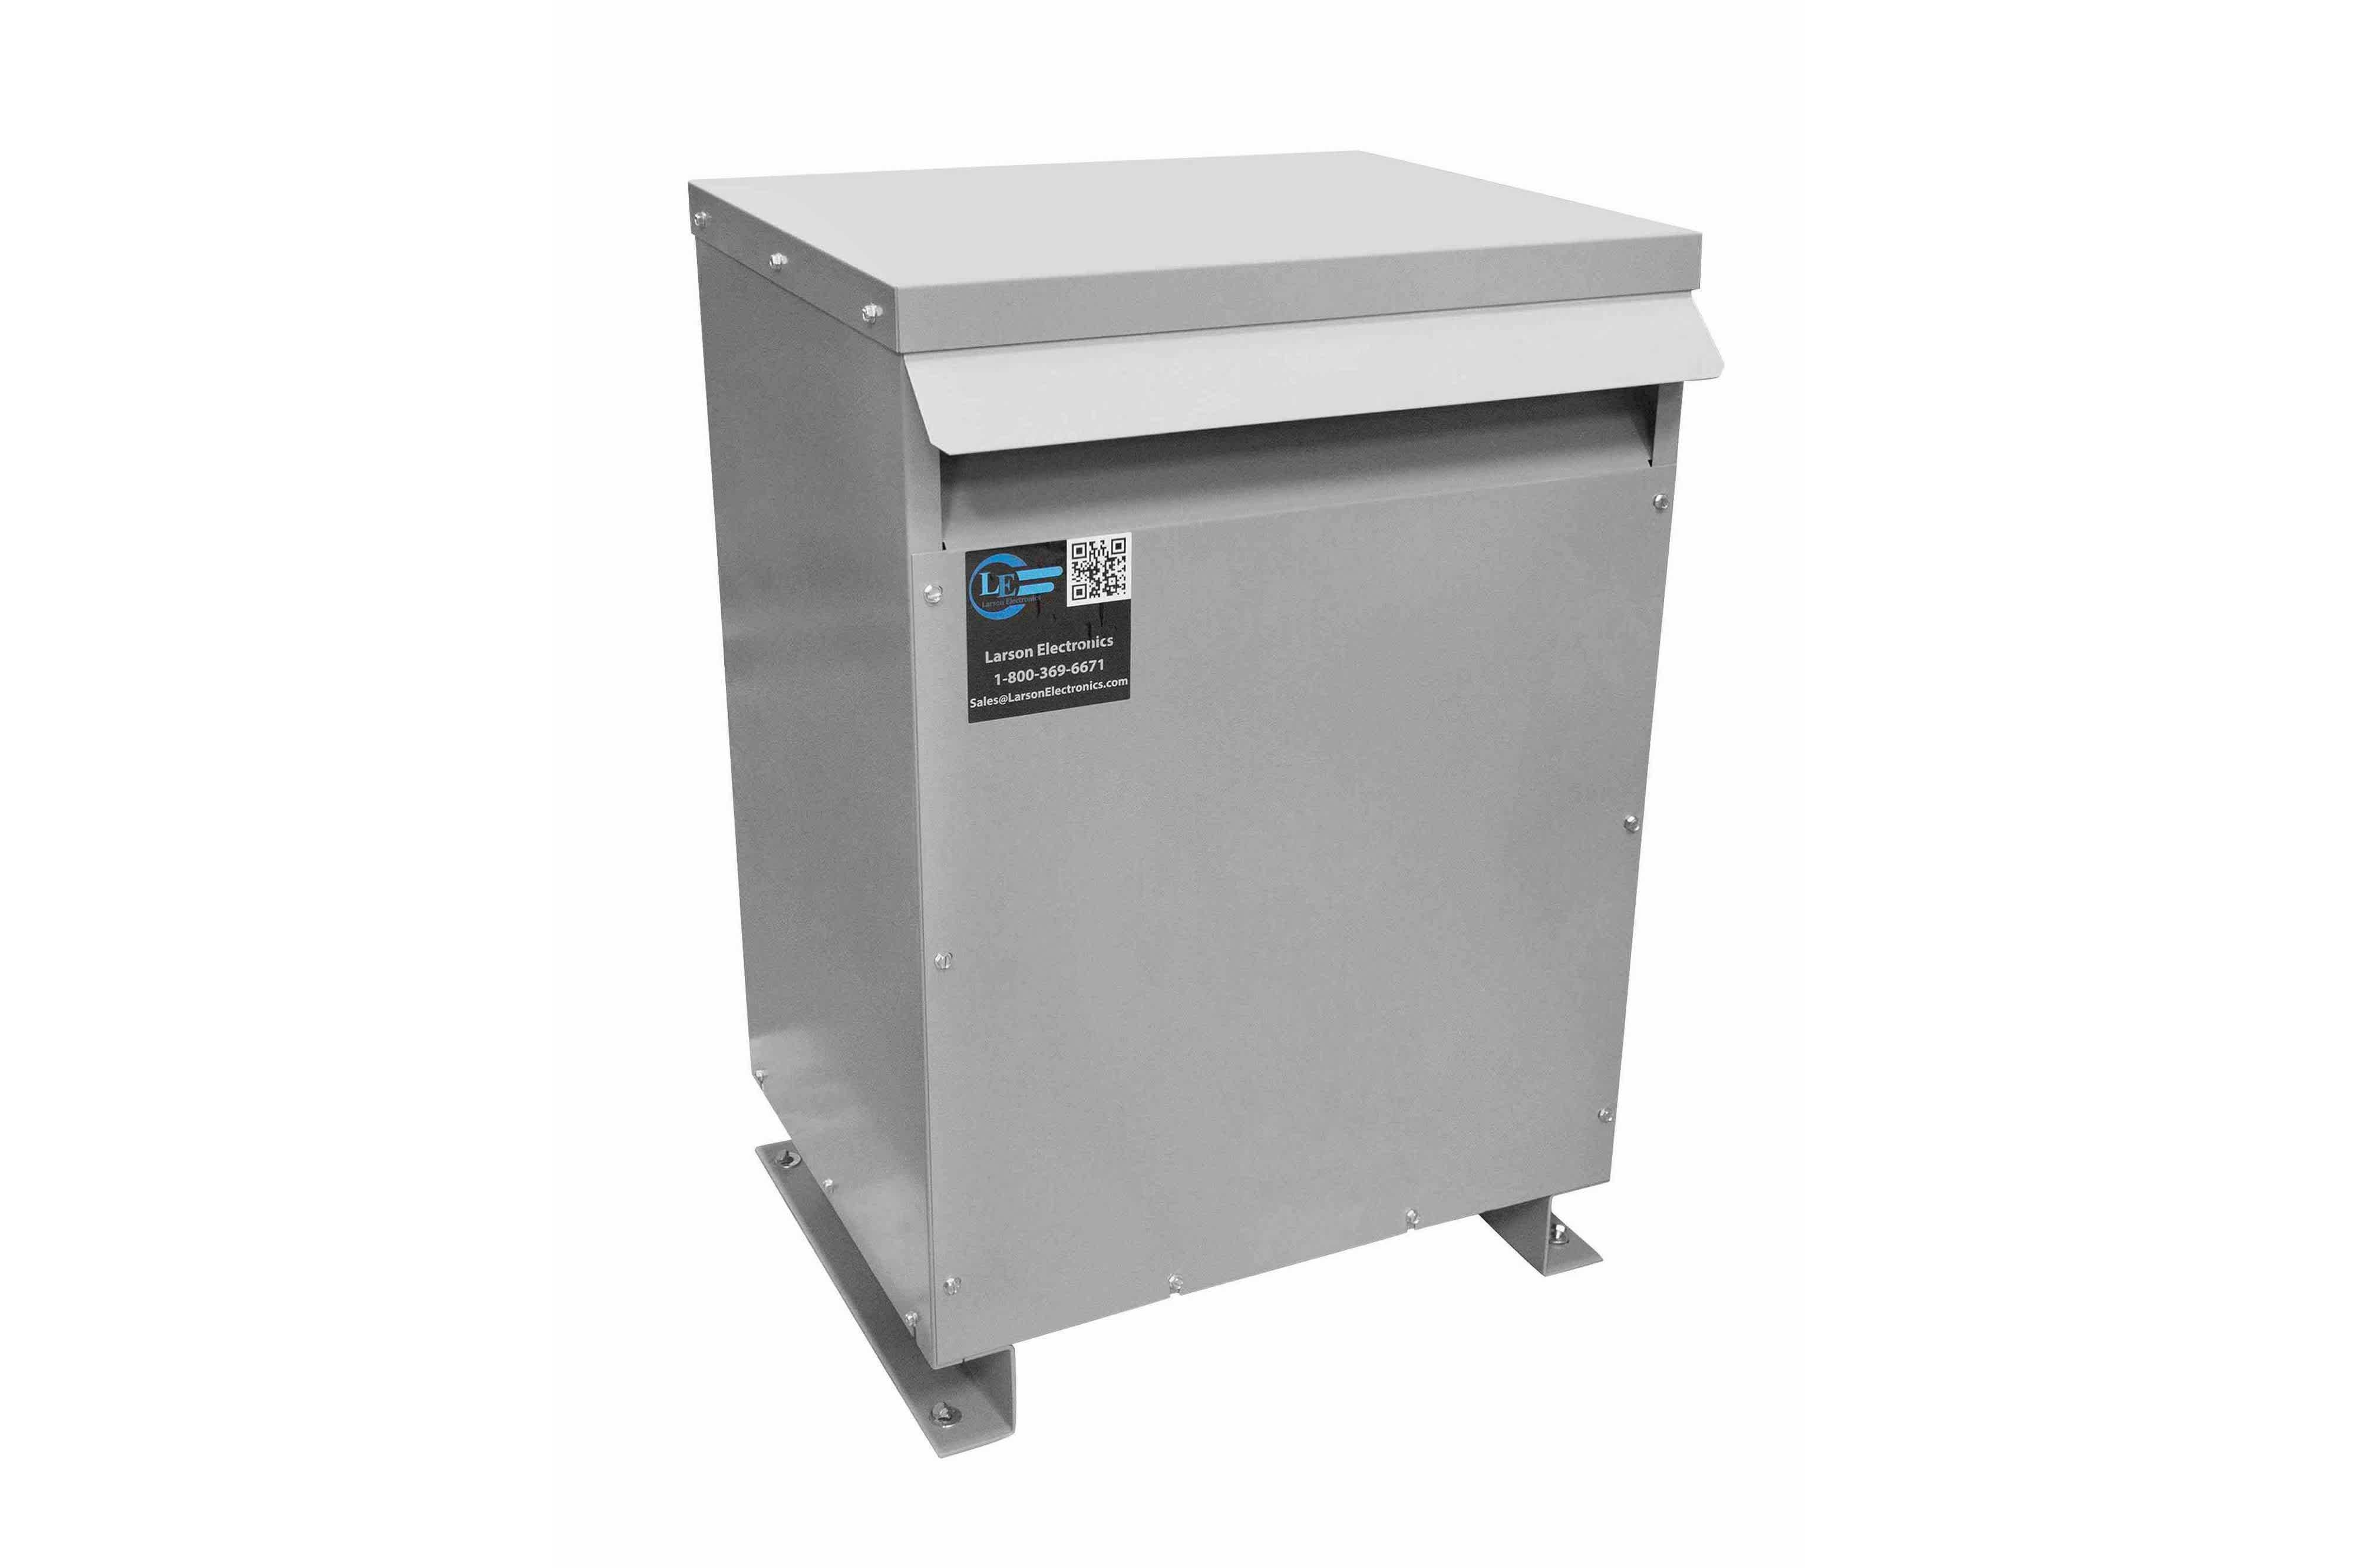 36 kVA 3PH Isolation Transformer, 600V Wye Primary, 415Y/240 Wye-N Secondary, N3R, Ventilated, 60 Hz